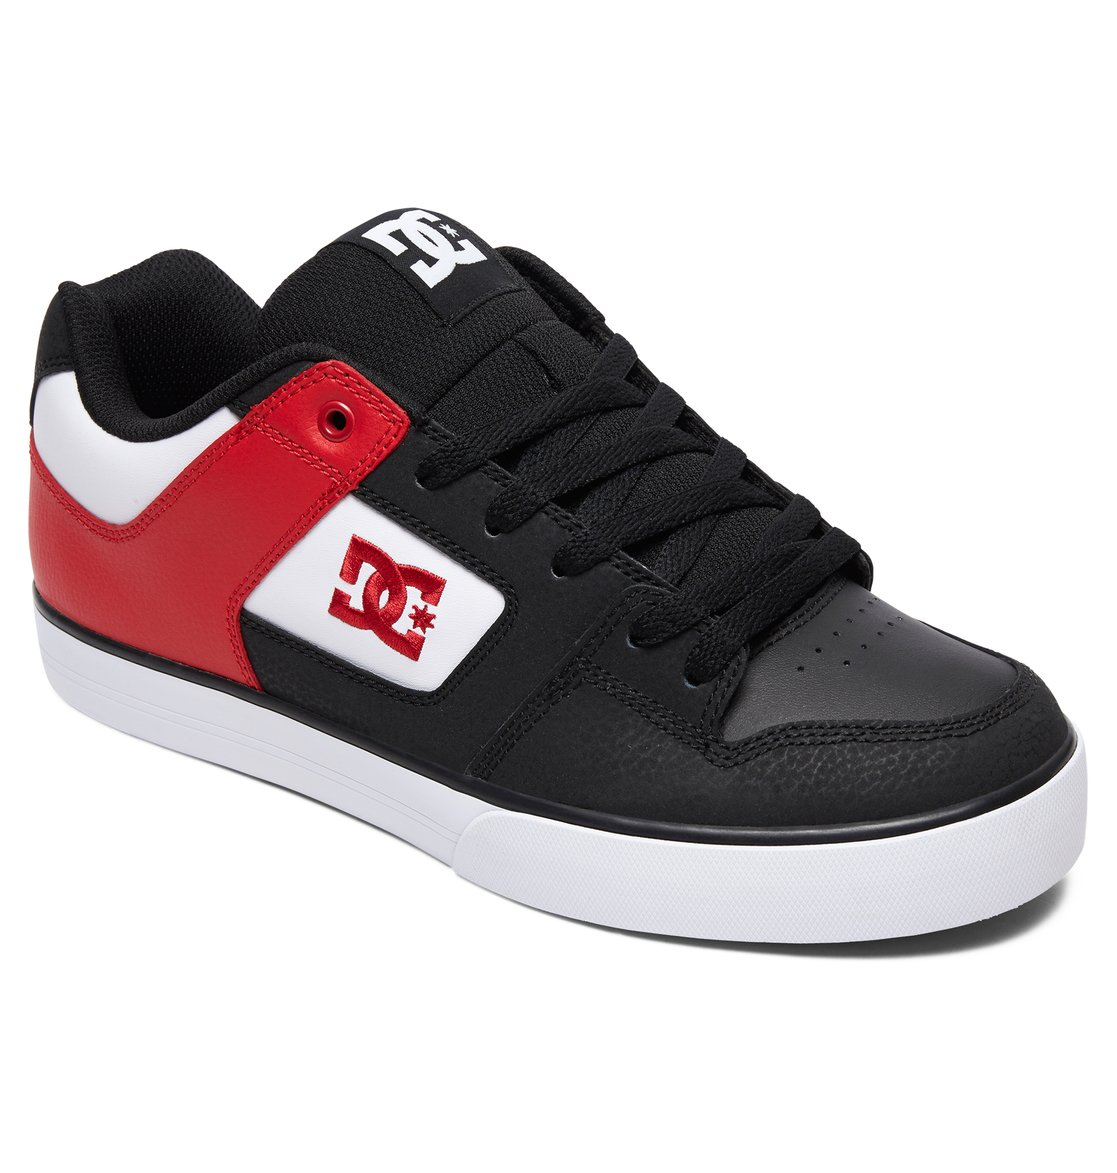 dc shoes pure low top shoes 300660 ebay. Black Bedroom Furniture Sets. Home Design Ideas